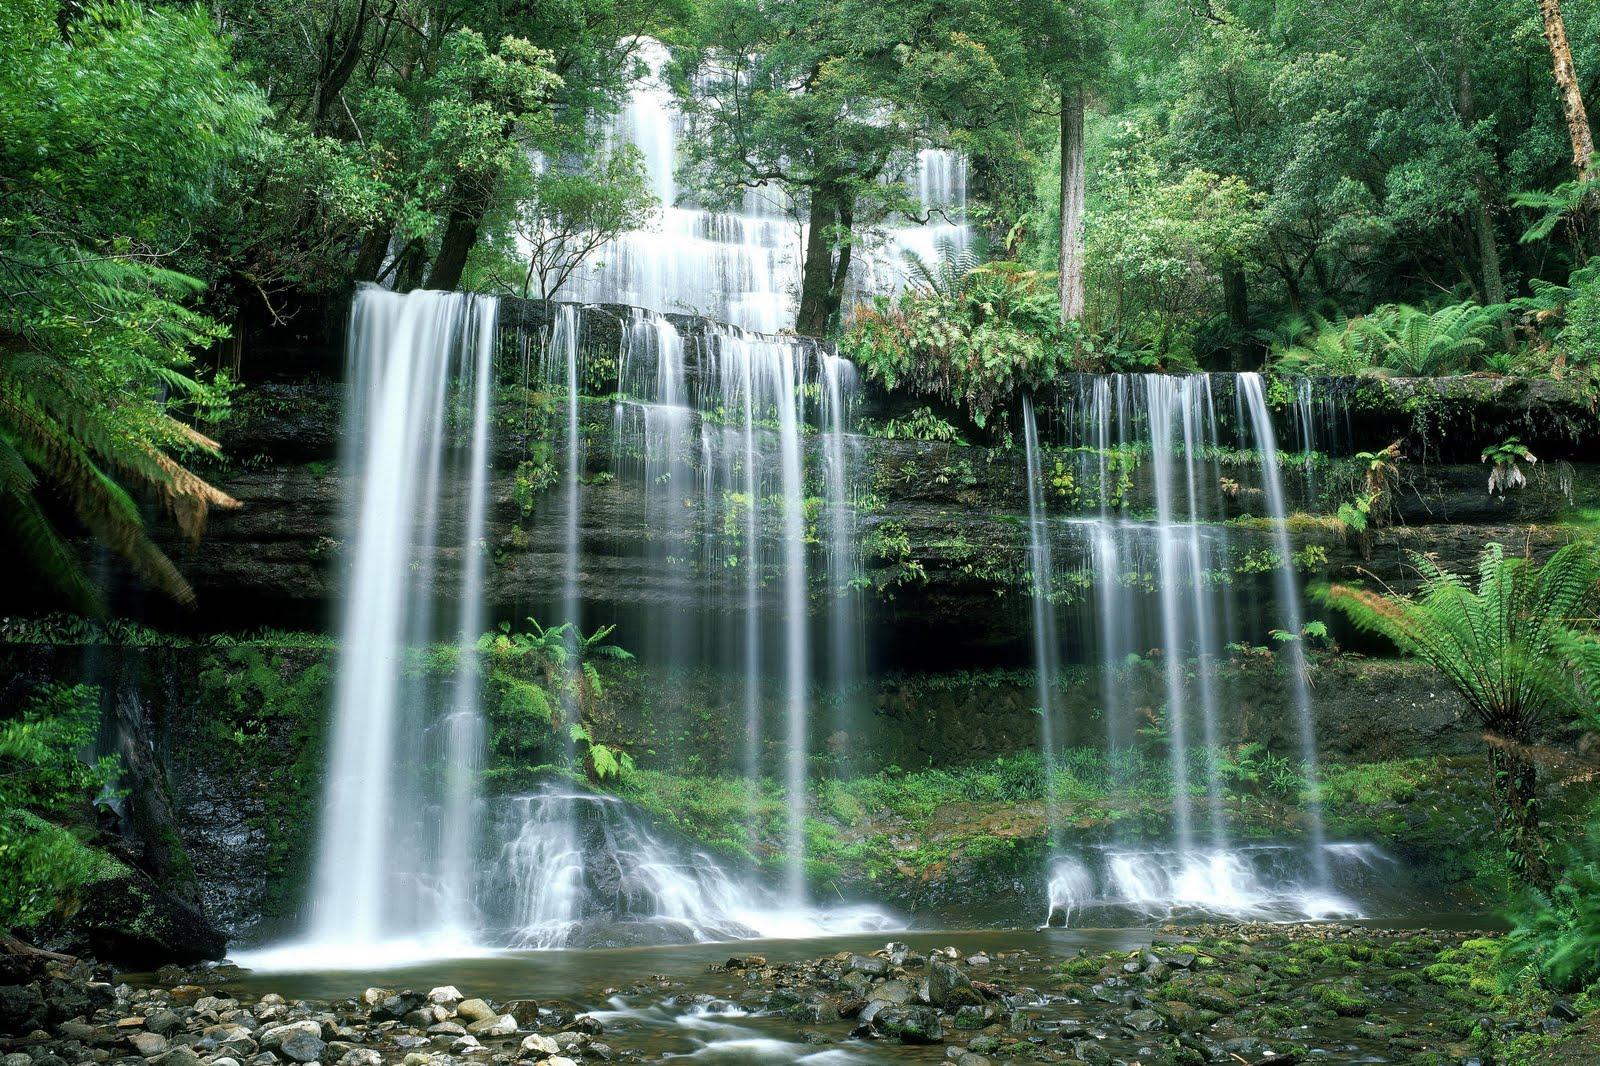 Great Falls Wallpapers Hd Widescreen Imagini Natura Poze Super Misto